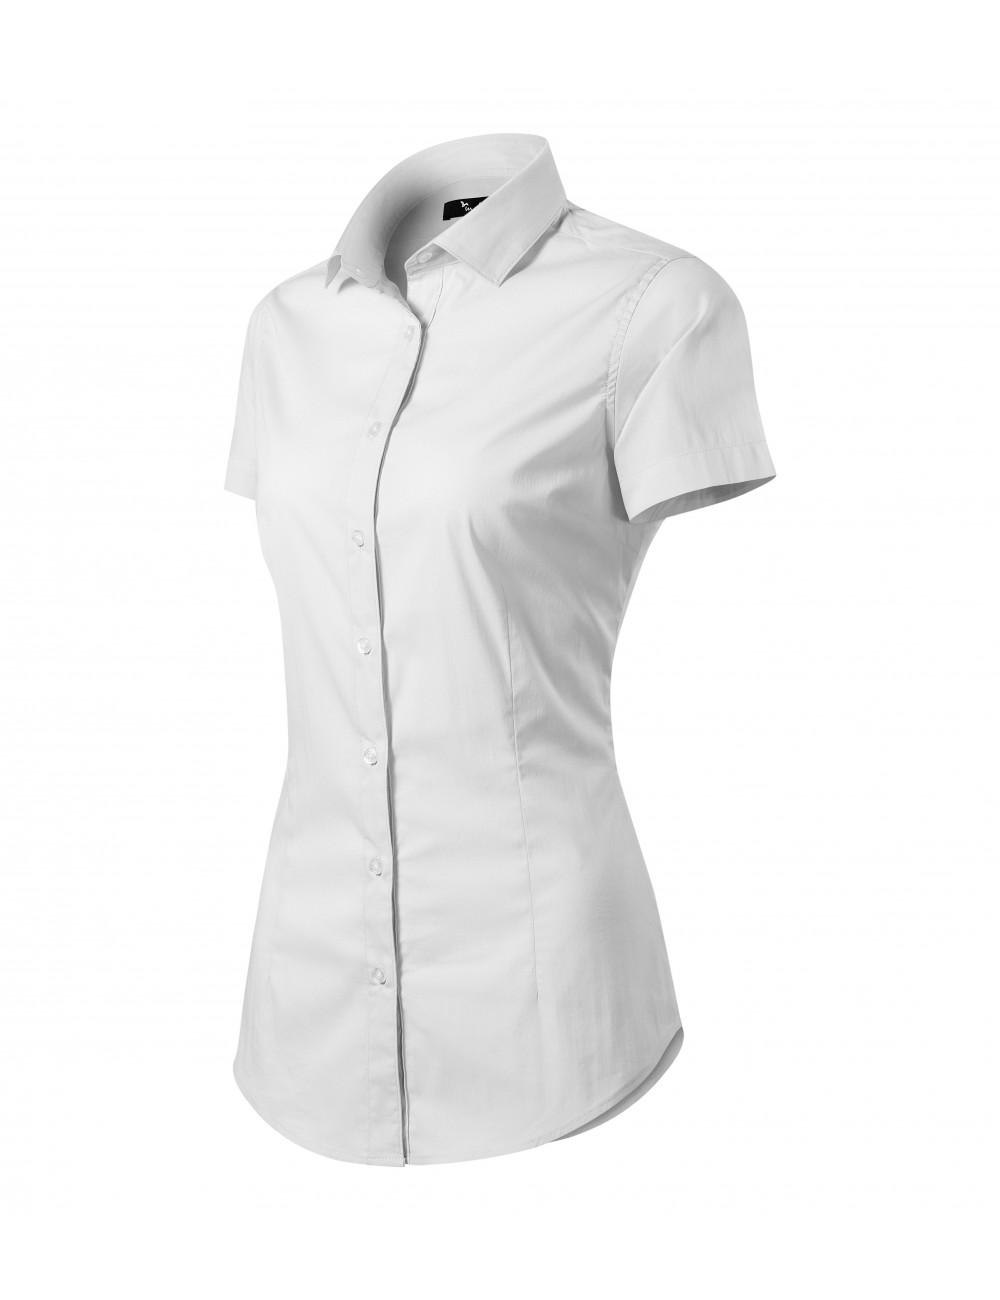 Adler MALFINIPREMIUM Koszula damska Flash 261 biały